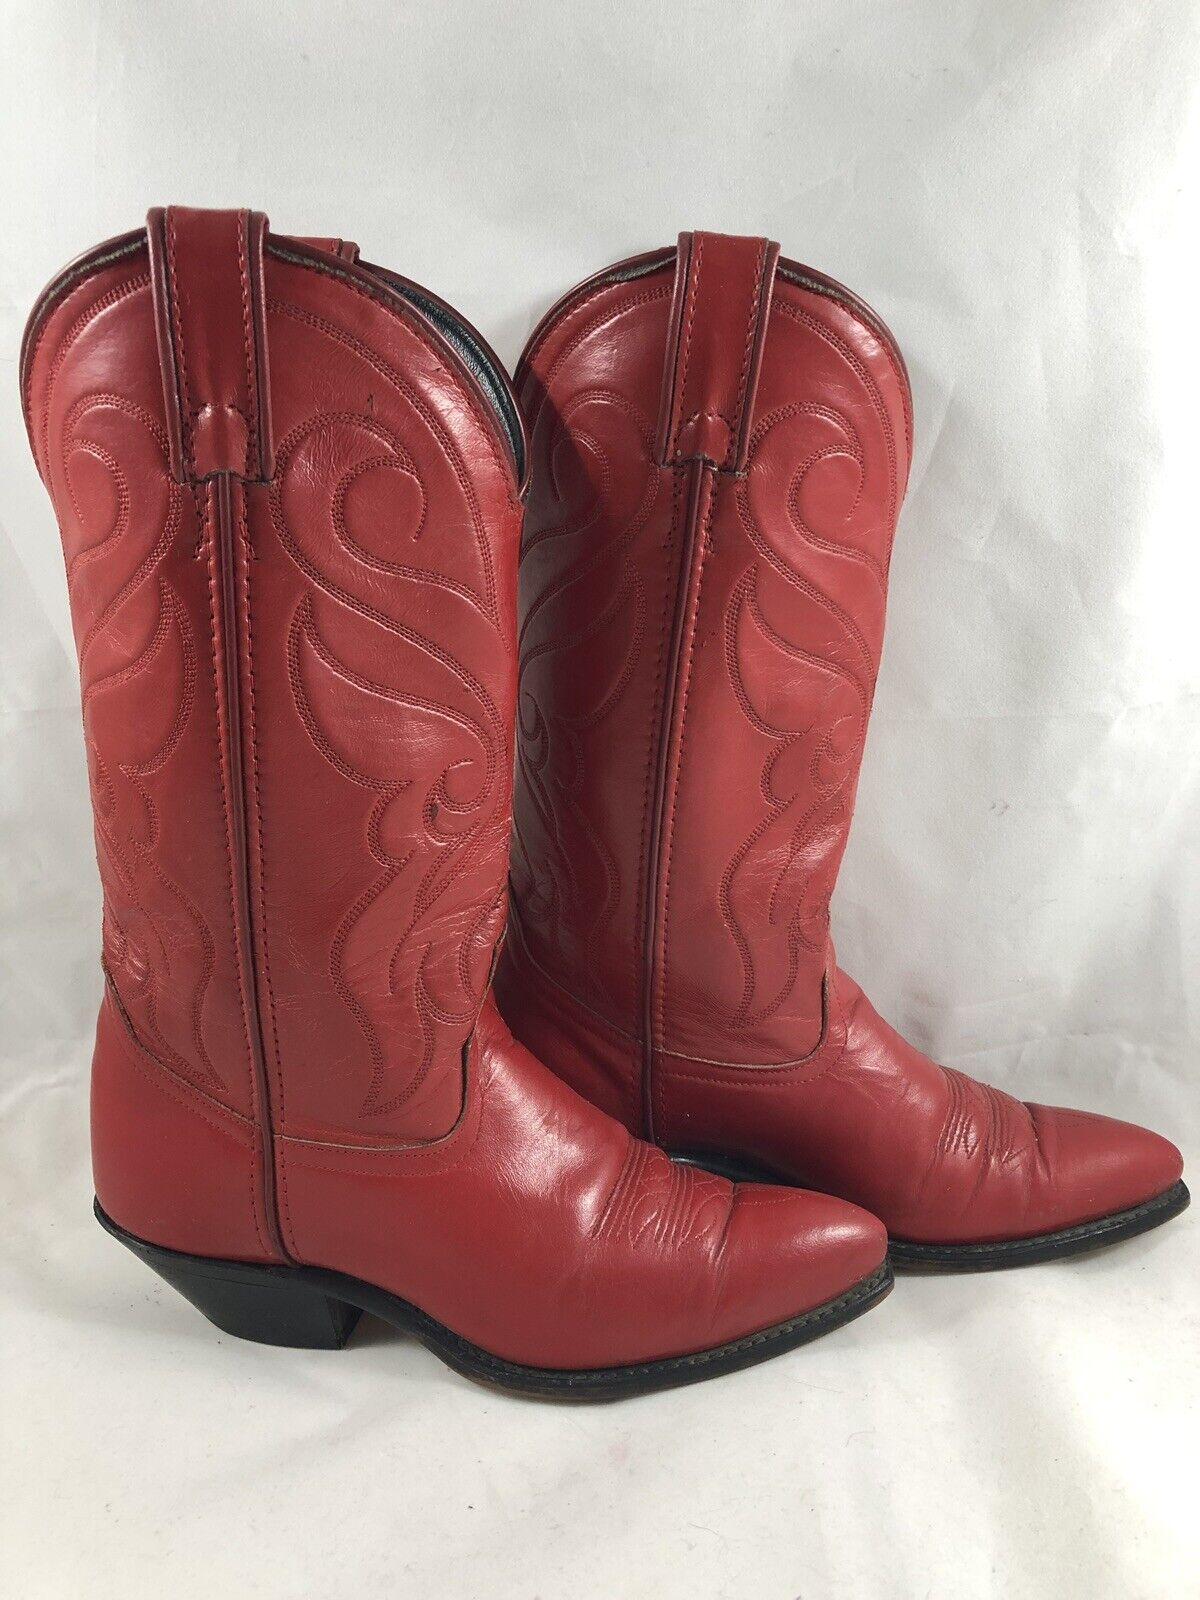 Santa Fe bota Co. para mujer  2 botas De Cuero M occidental Artesanal Rojo 5.5 M